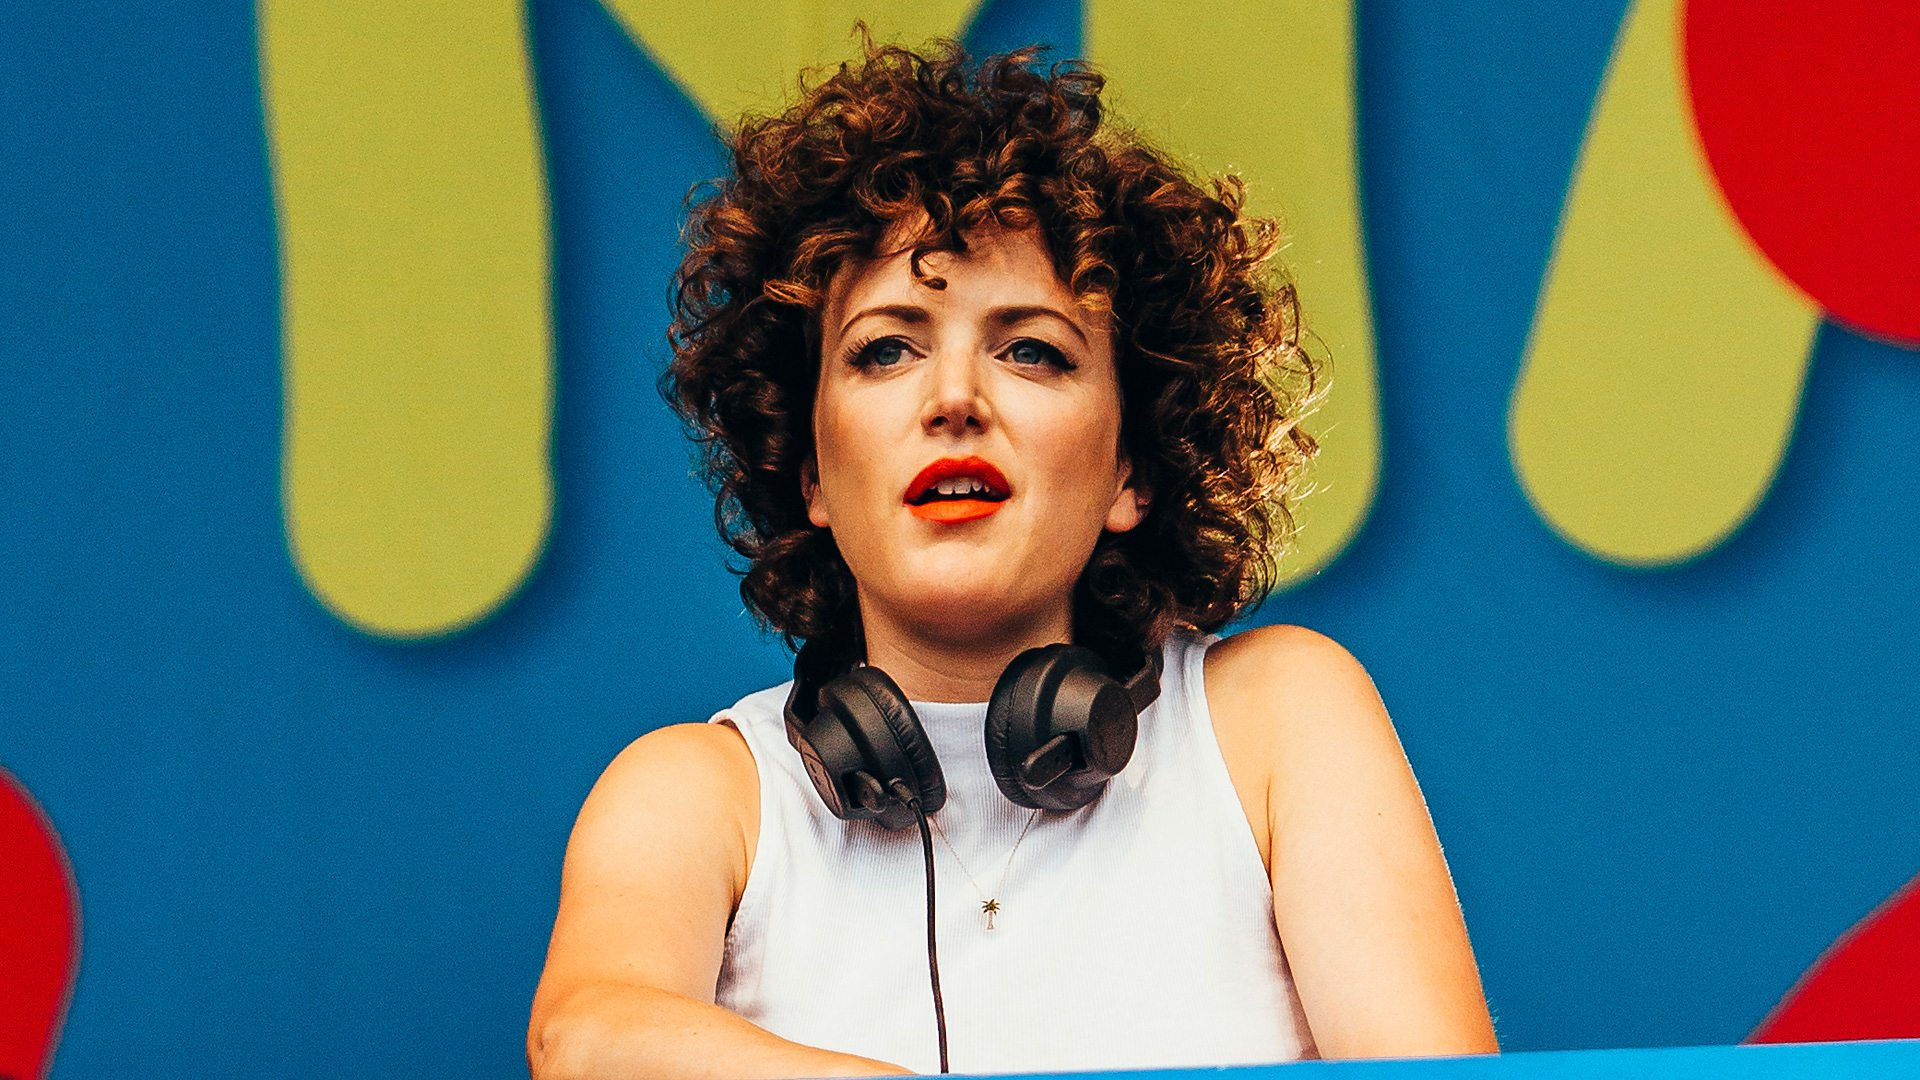 Annie Mac Radio 1 Weekend Ibiza 2020